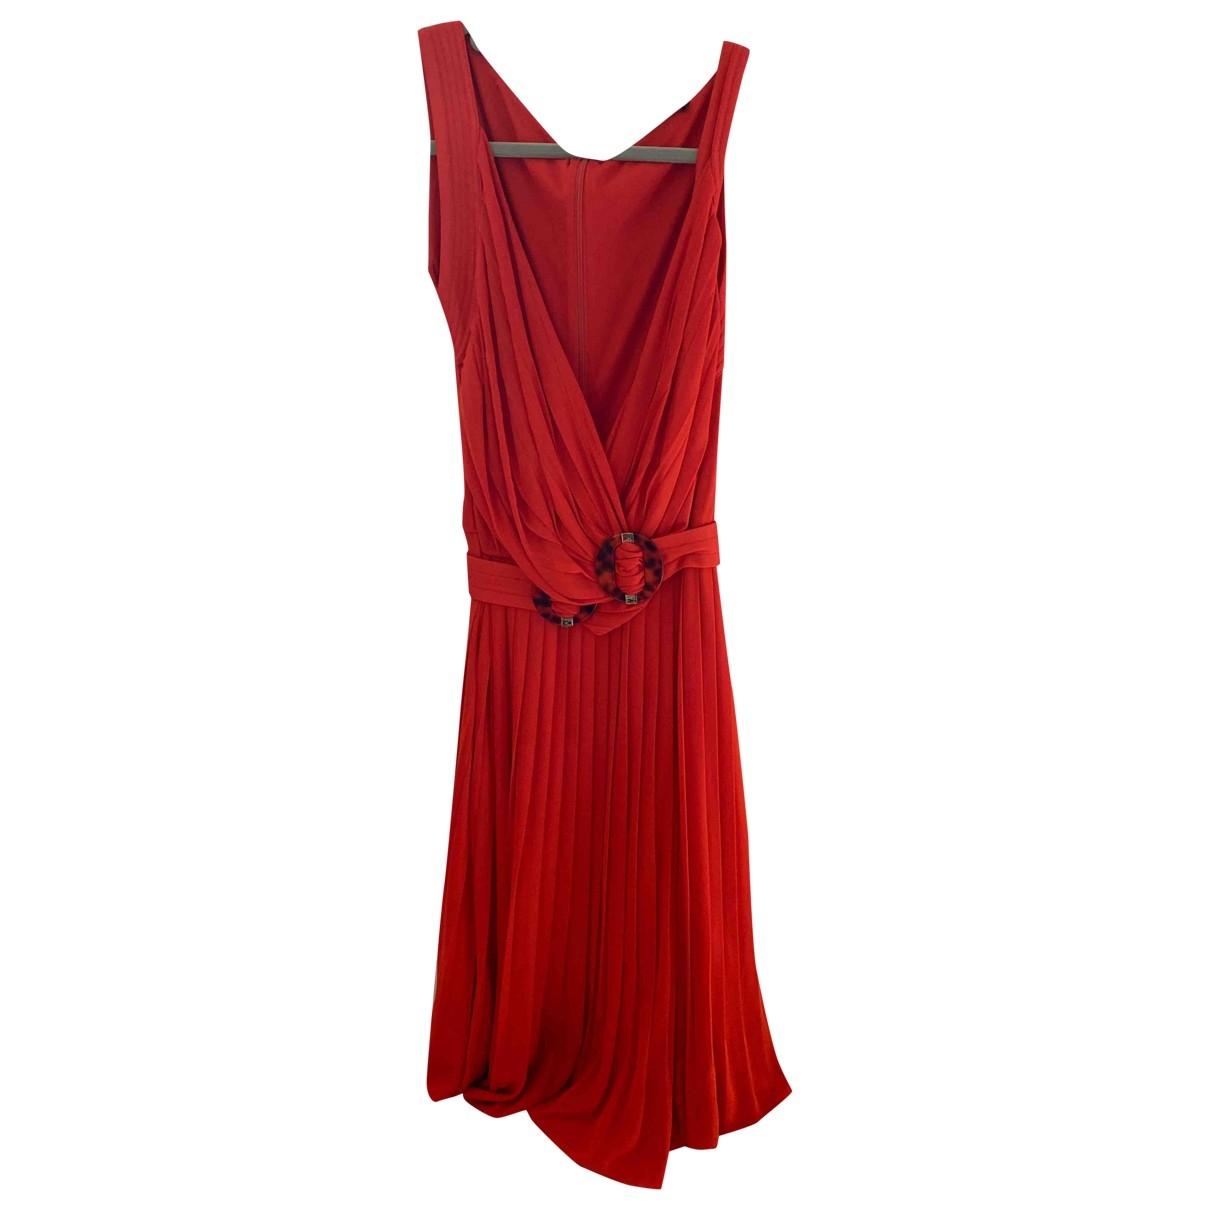 Gucci \N Red dress for Women XS International